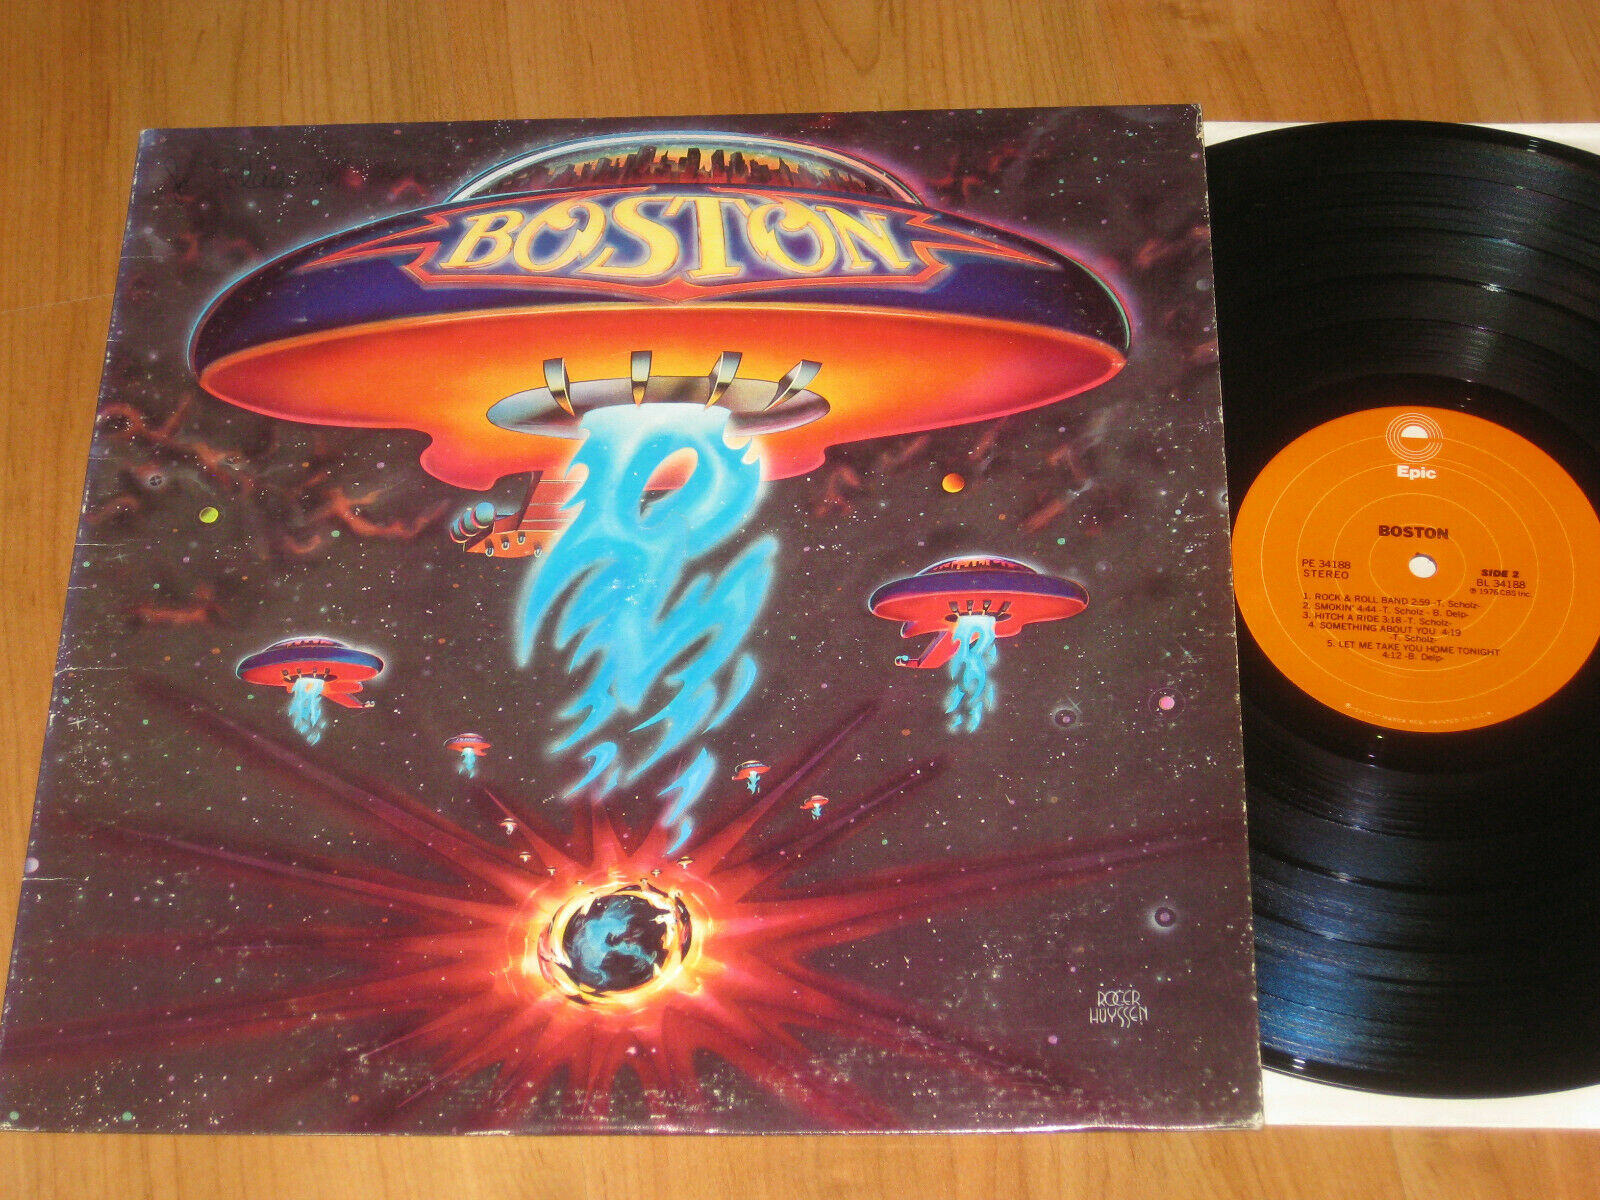 Boston - Same LP 1976 USA / Original / mit More than a feeling